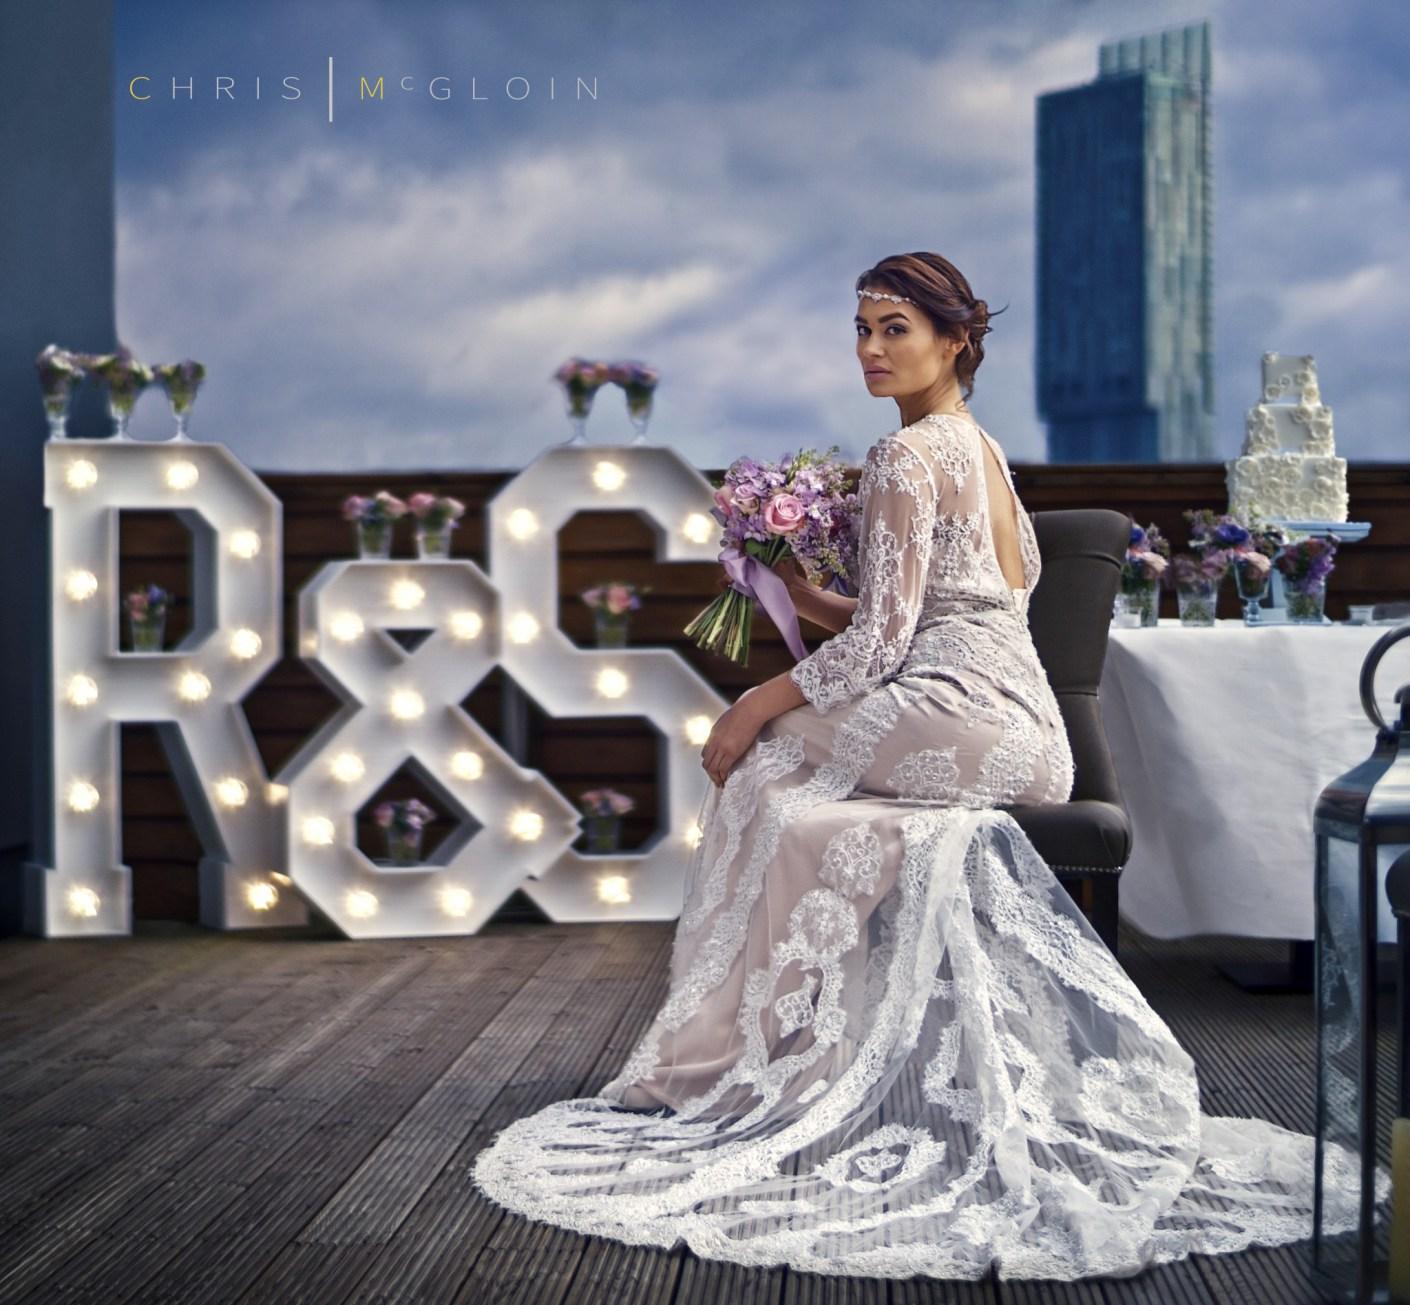 Chris McGloin Films & Photography Stylish wedding photography and film